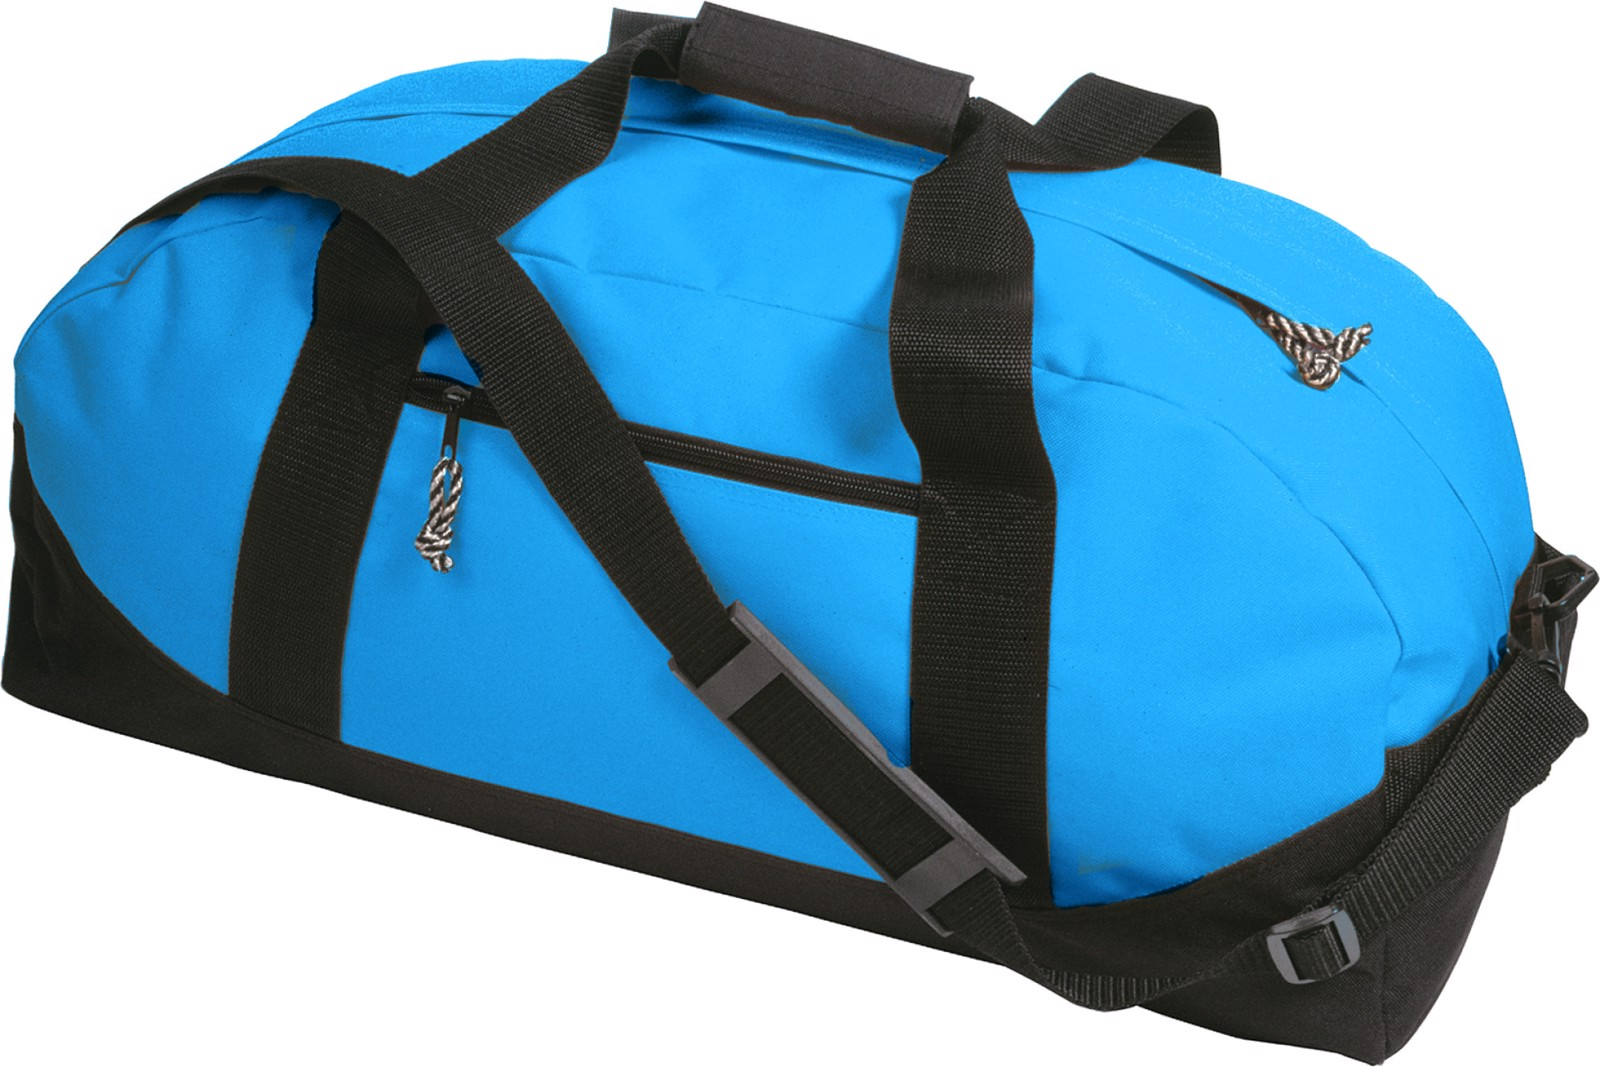 Polyester (600D) sports bag - Light Blue